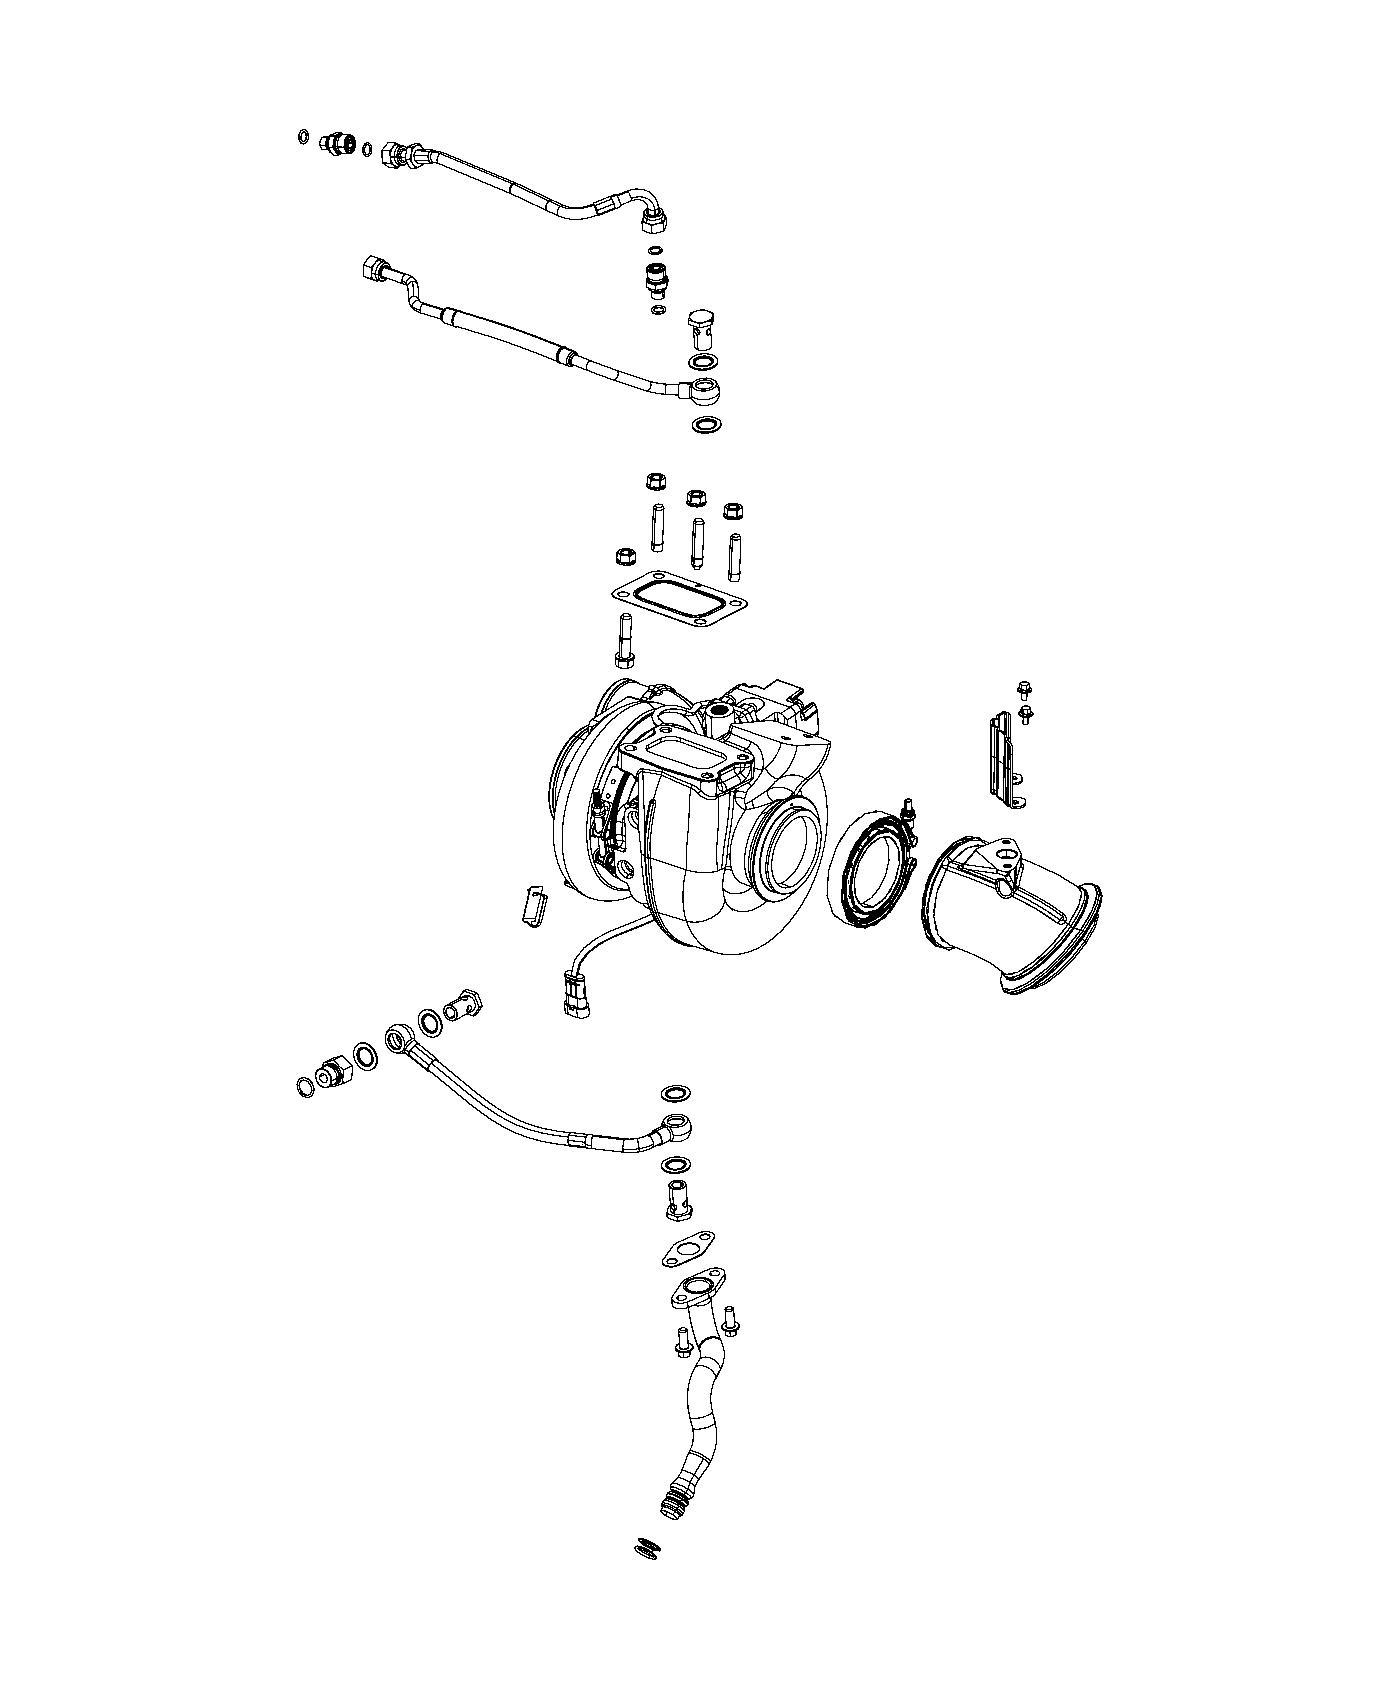 Dodge Ram Turbocharger Emissions Statesel